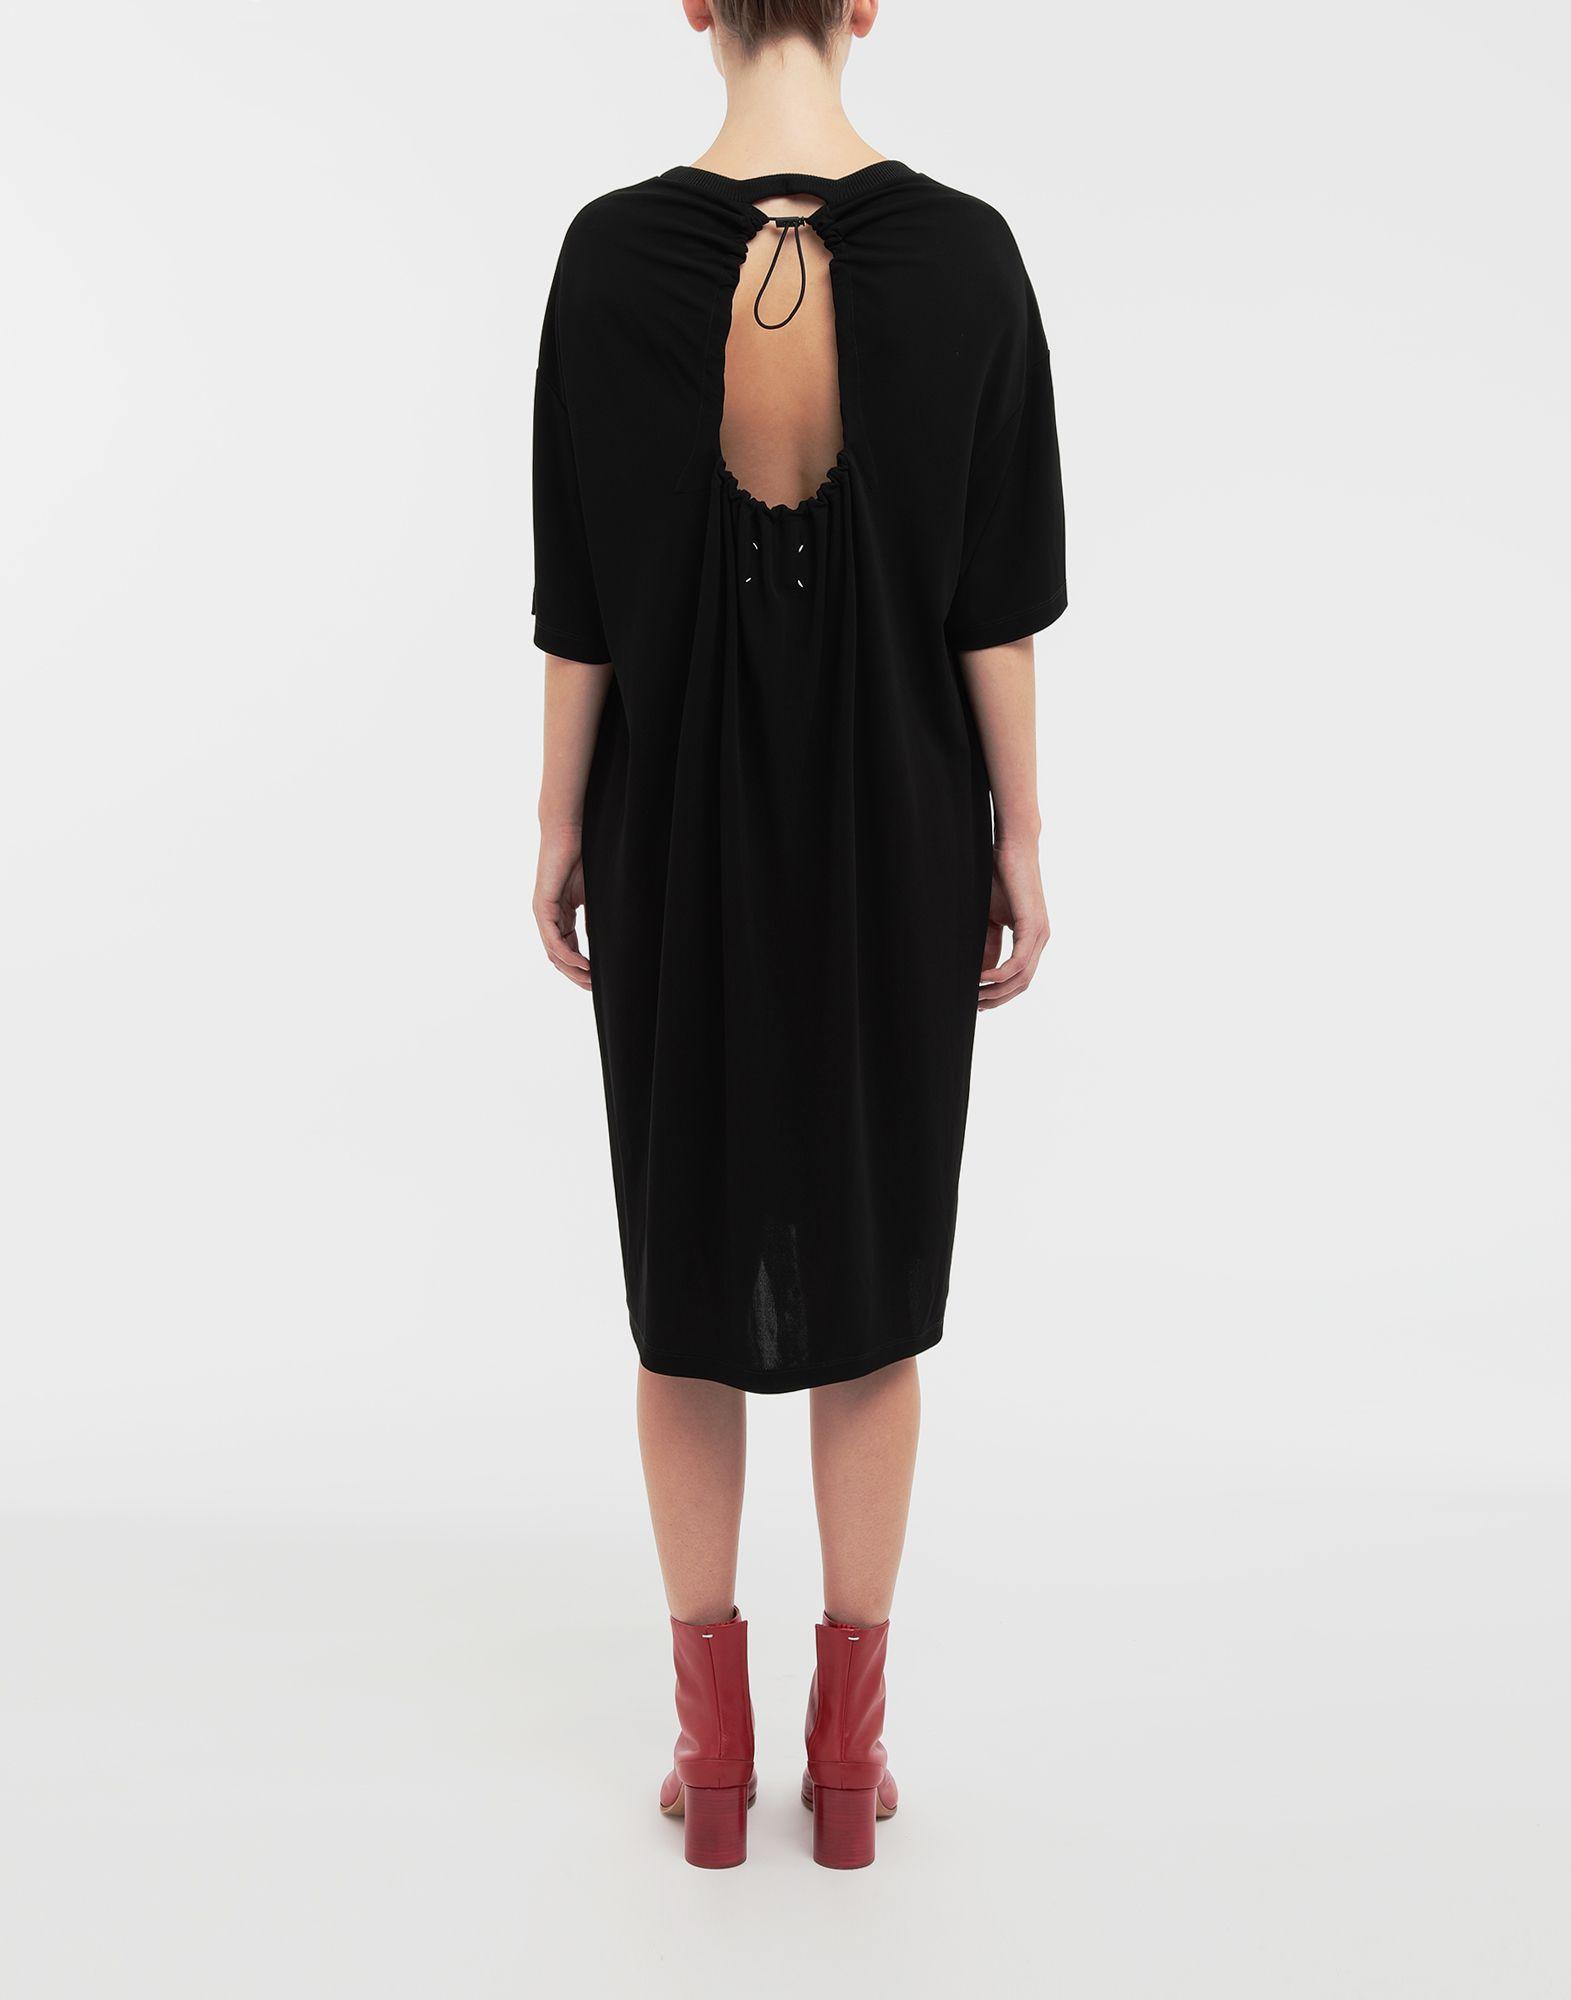 MAISON MARGIELA Ruched back jersey day dress Short dress Woman e